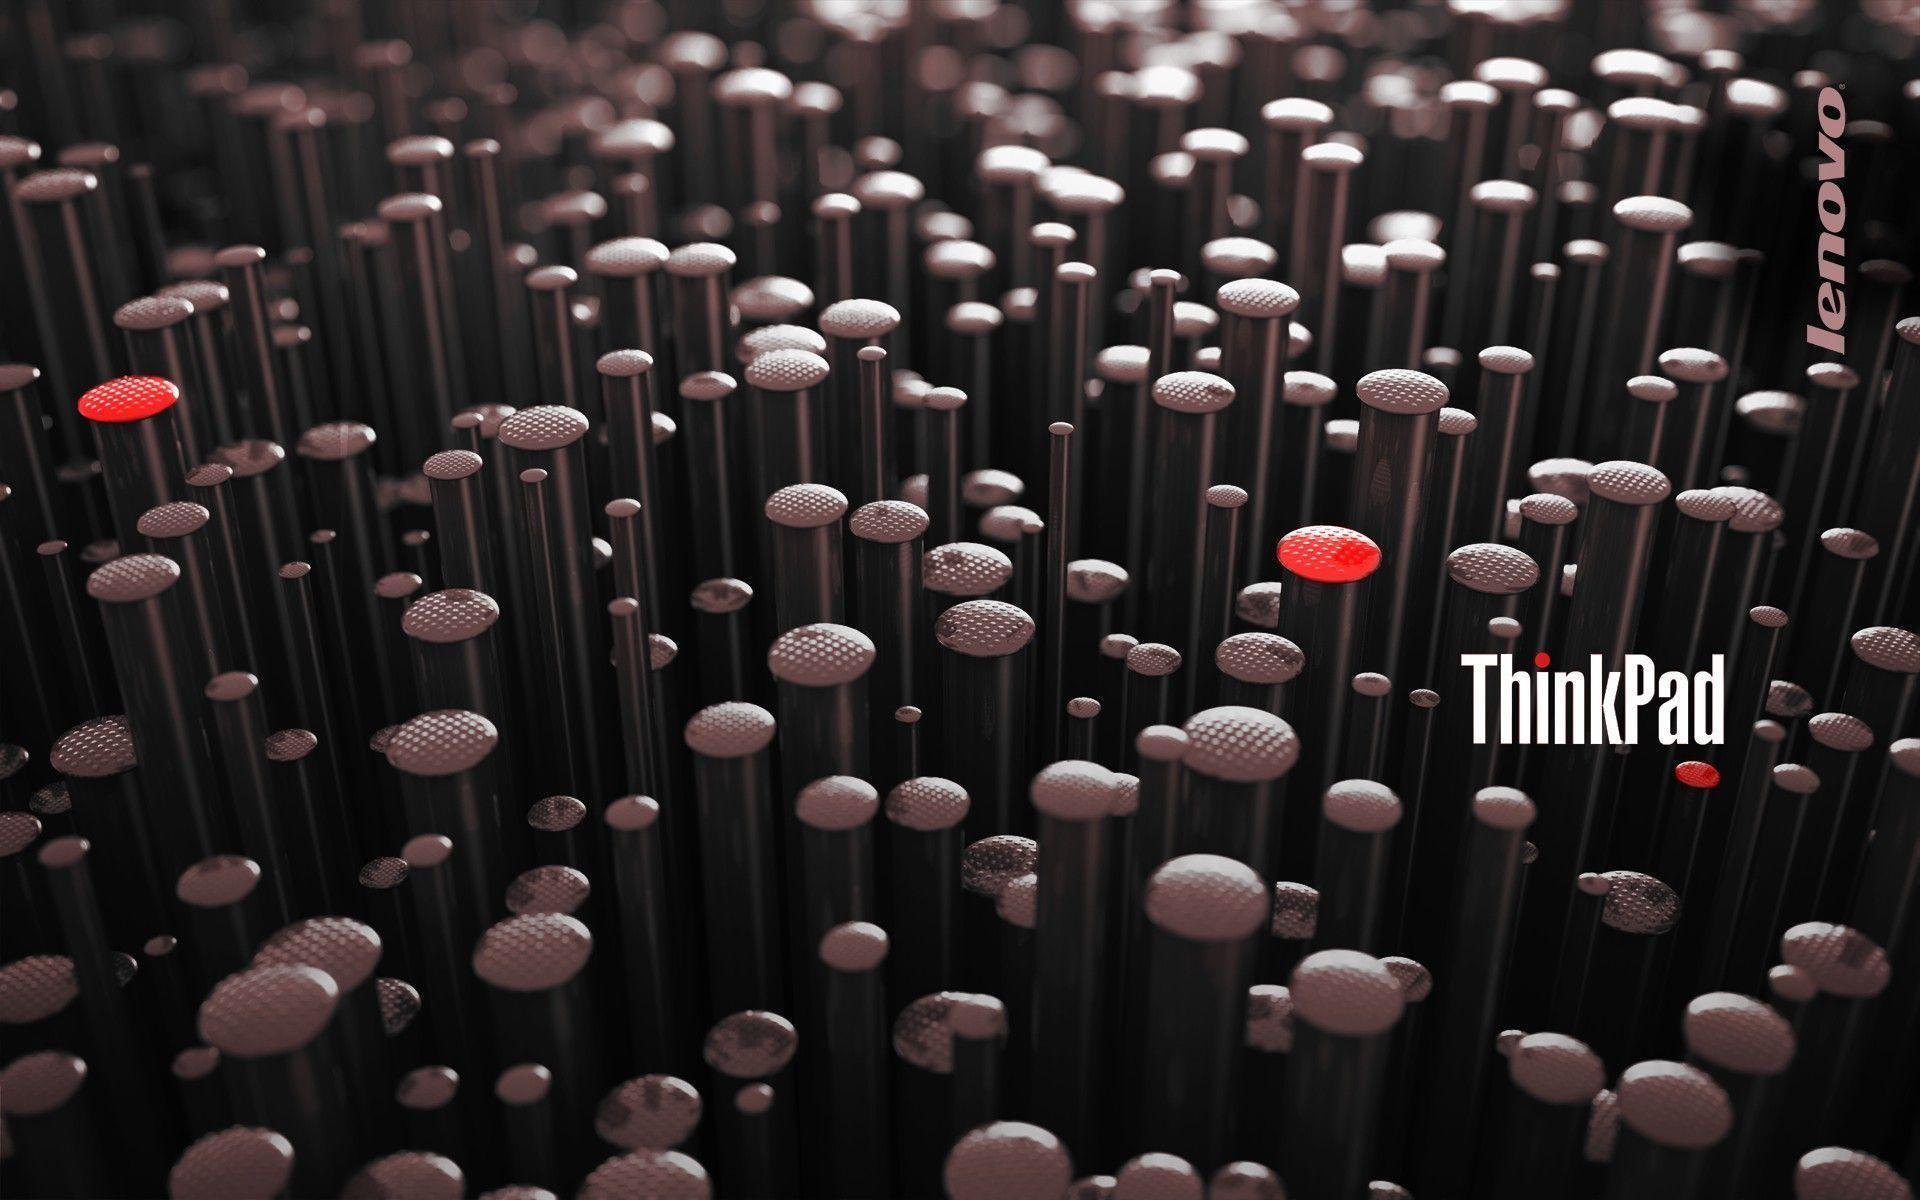 Res: 1920x1200, Lenovo ThinkPad - Wallpaper #